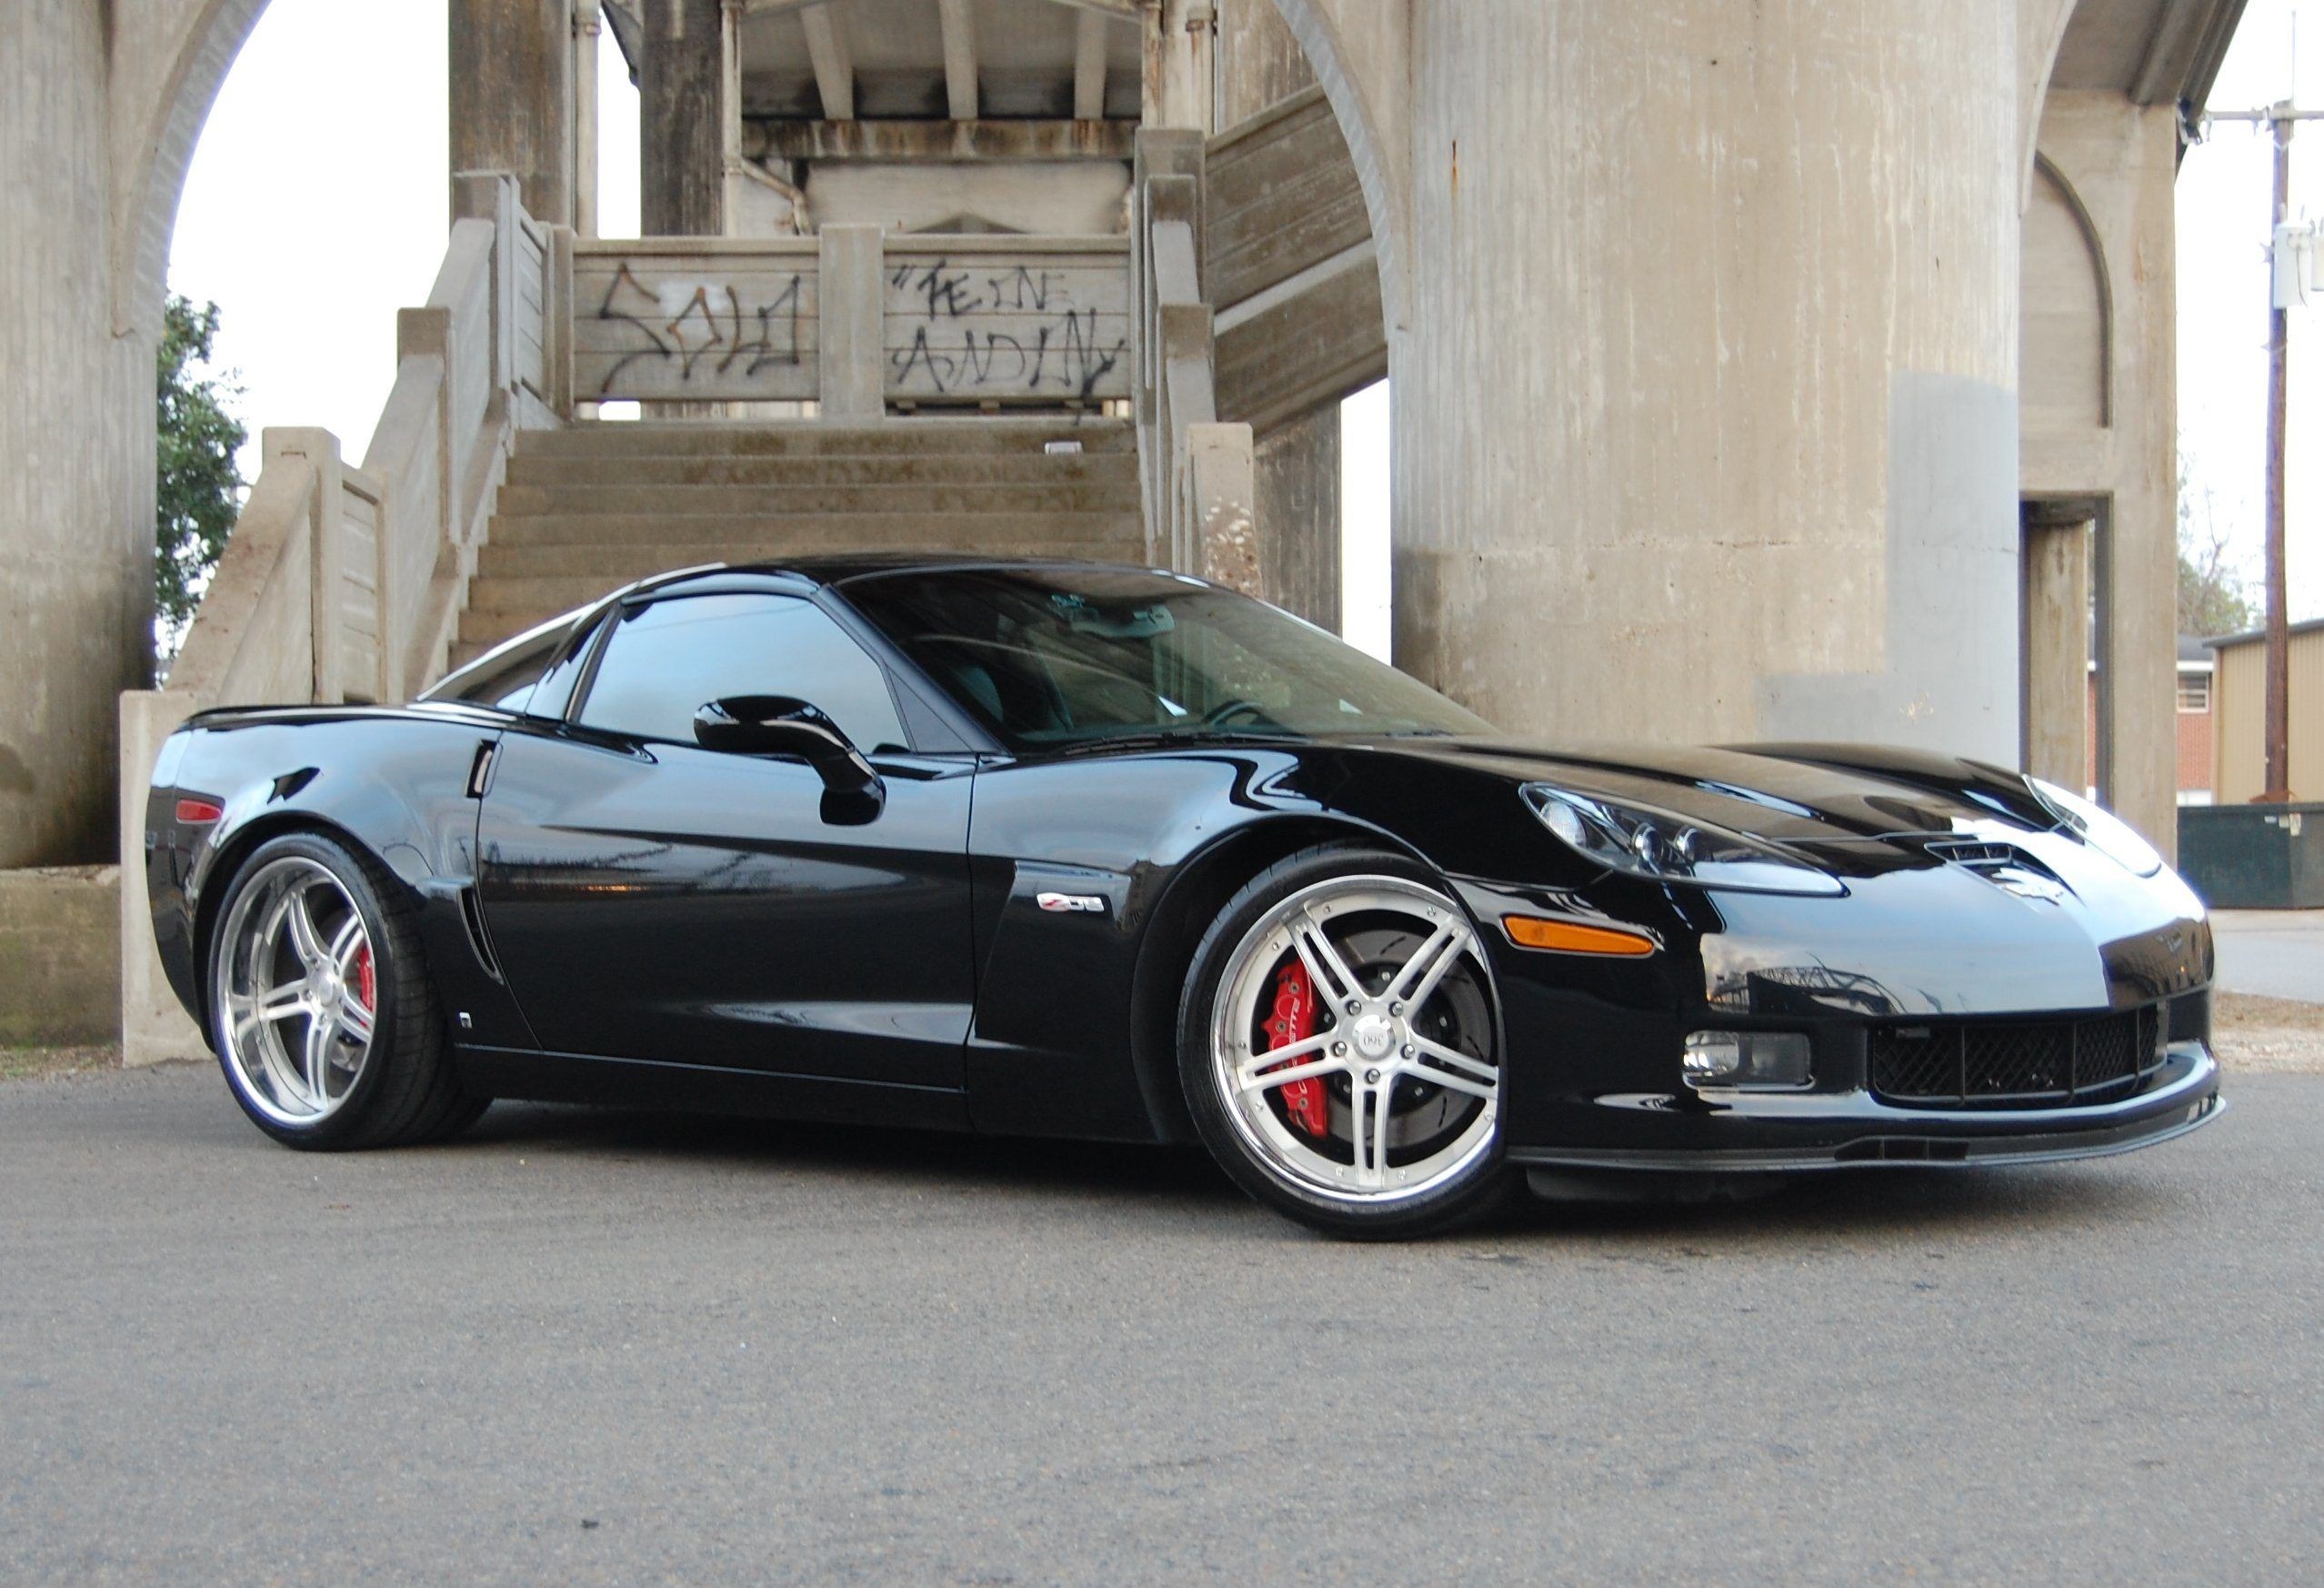 2007 C6 Corvette Image Gallery Pictures Corvette Chevy Corvette Chevrolet Corvette